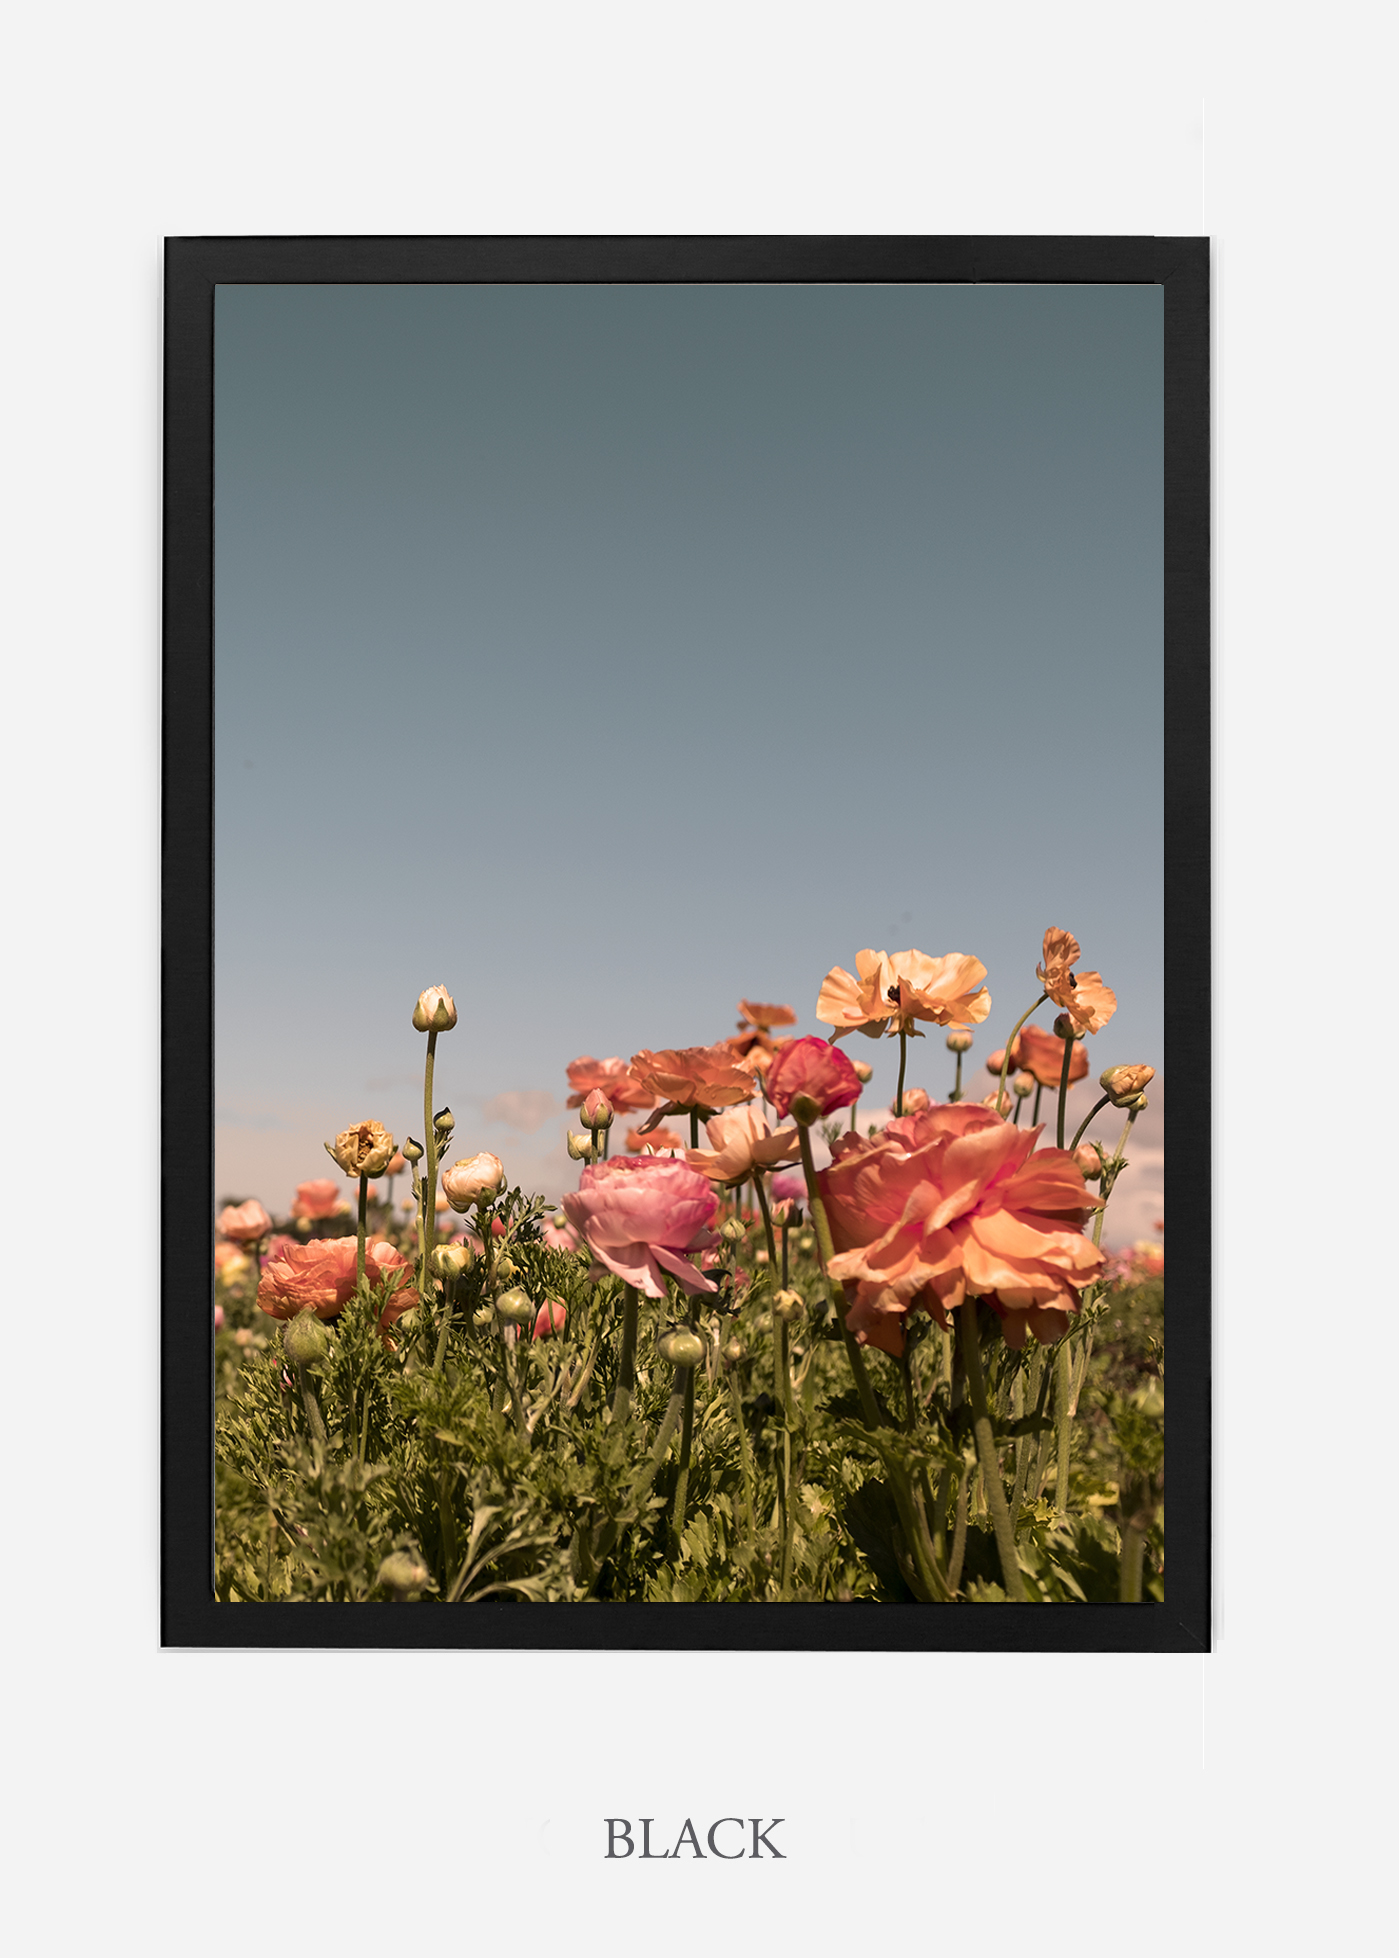 NoMat-Black-Frame-Floral-No-1-Wilder-California-Art-Floral-Home-decor-Prints-Dahlia-Botanical-Artwork-Interior-design.jpg